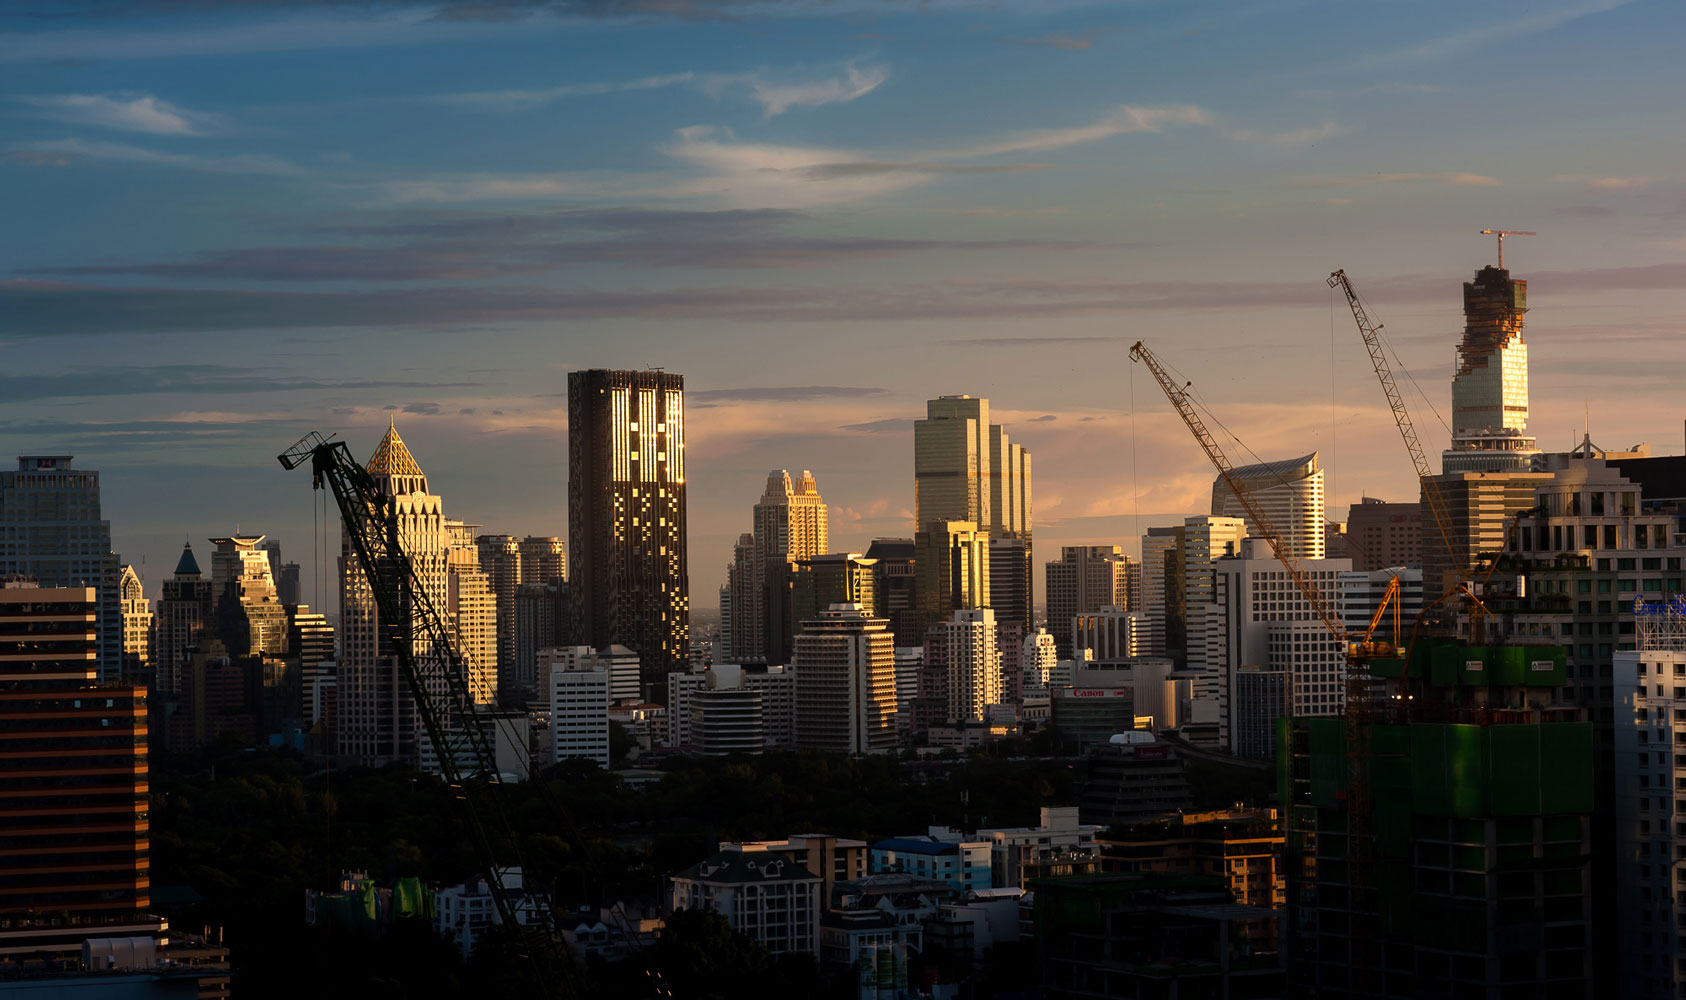 Bangkok skyline at night shooting location